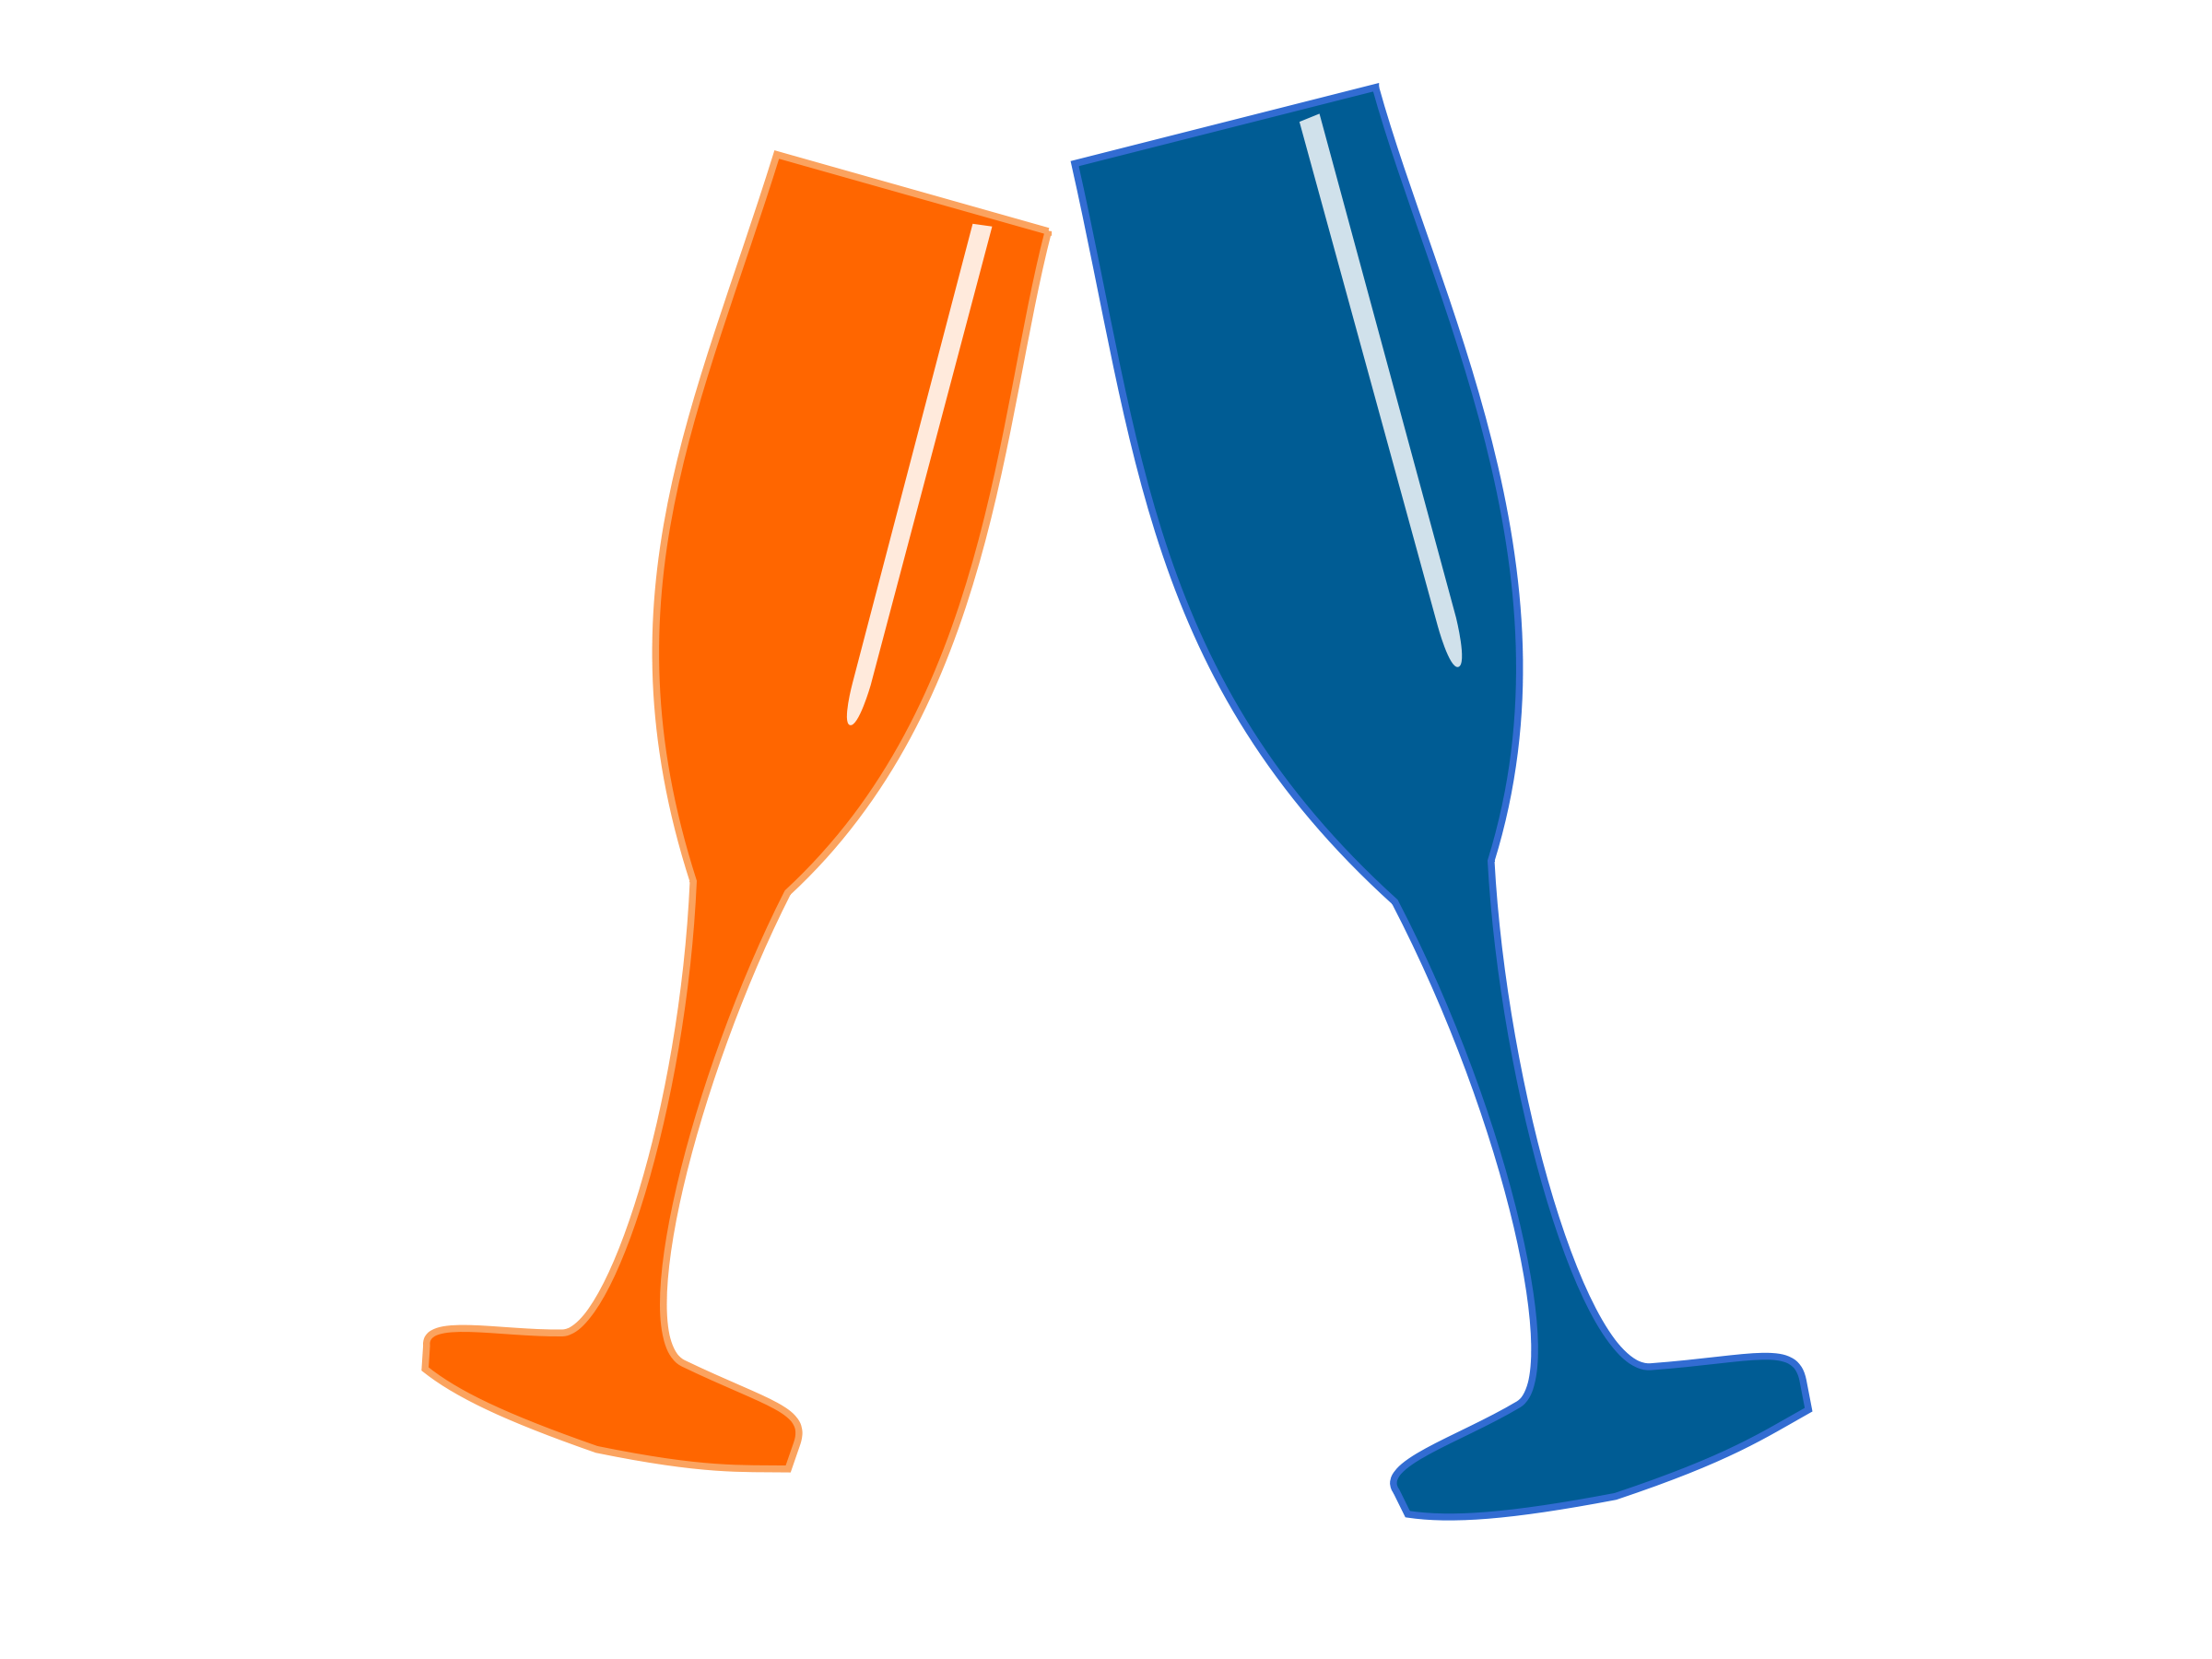 Champagne Flute Clip Art - ClipArt Best